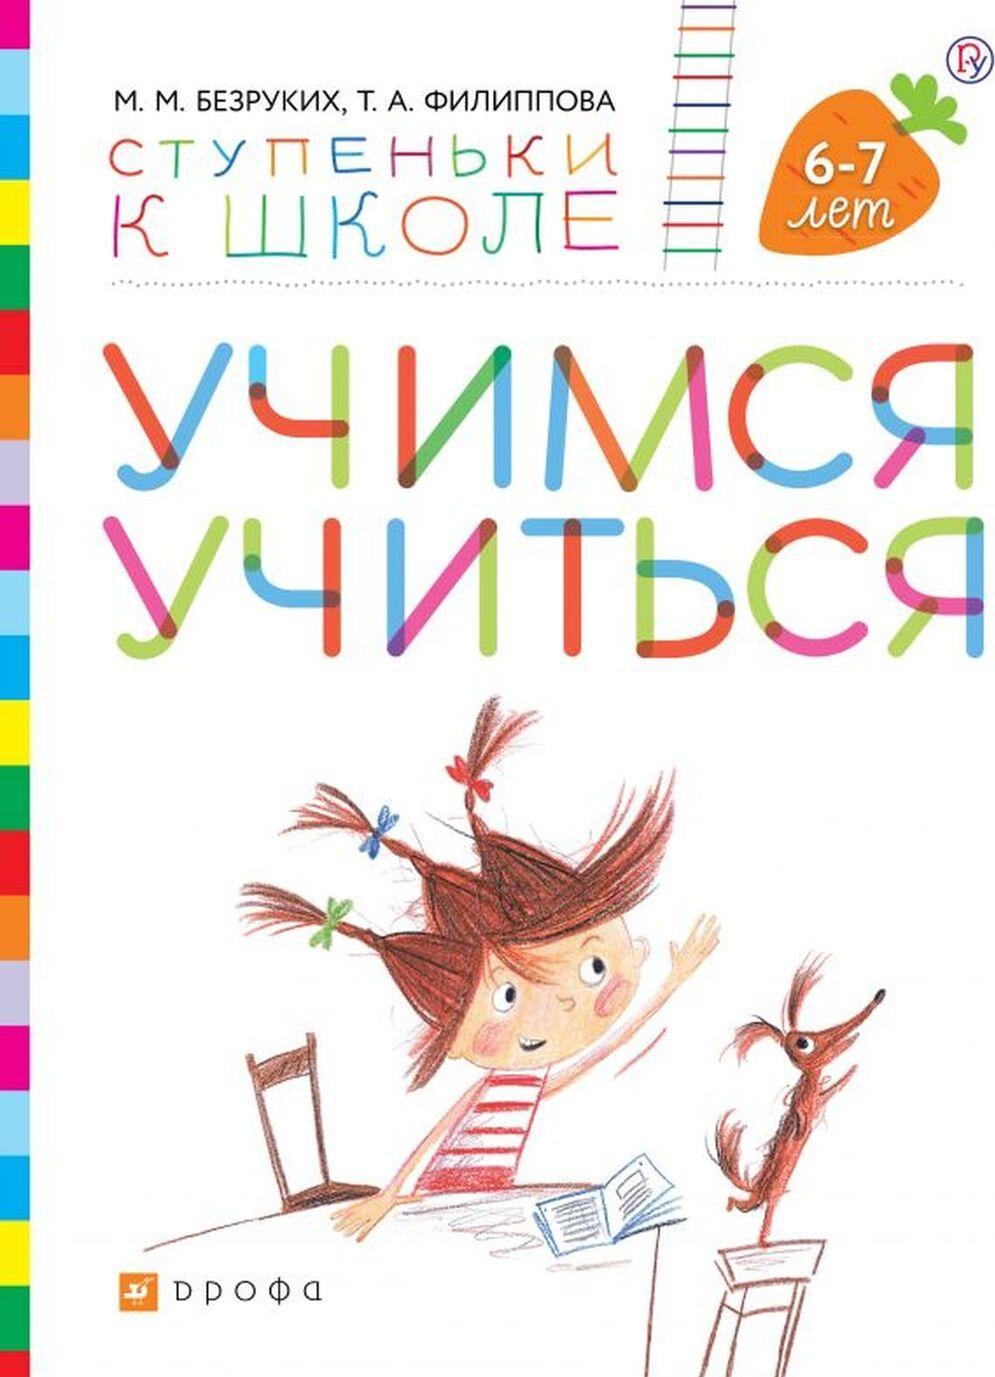 Uchimsja uchitsja. Posobie dlja detej 6-7 let (+ naklejki) | Bezrukikh Marjana Mikhajlovna, Filippova Tatjana Andreevna